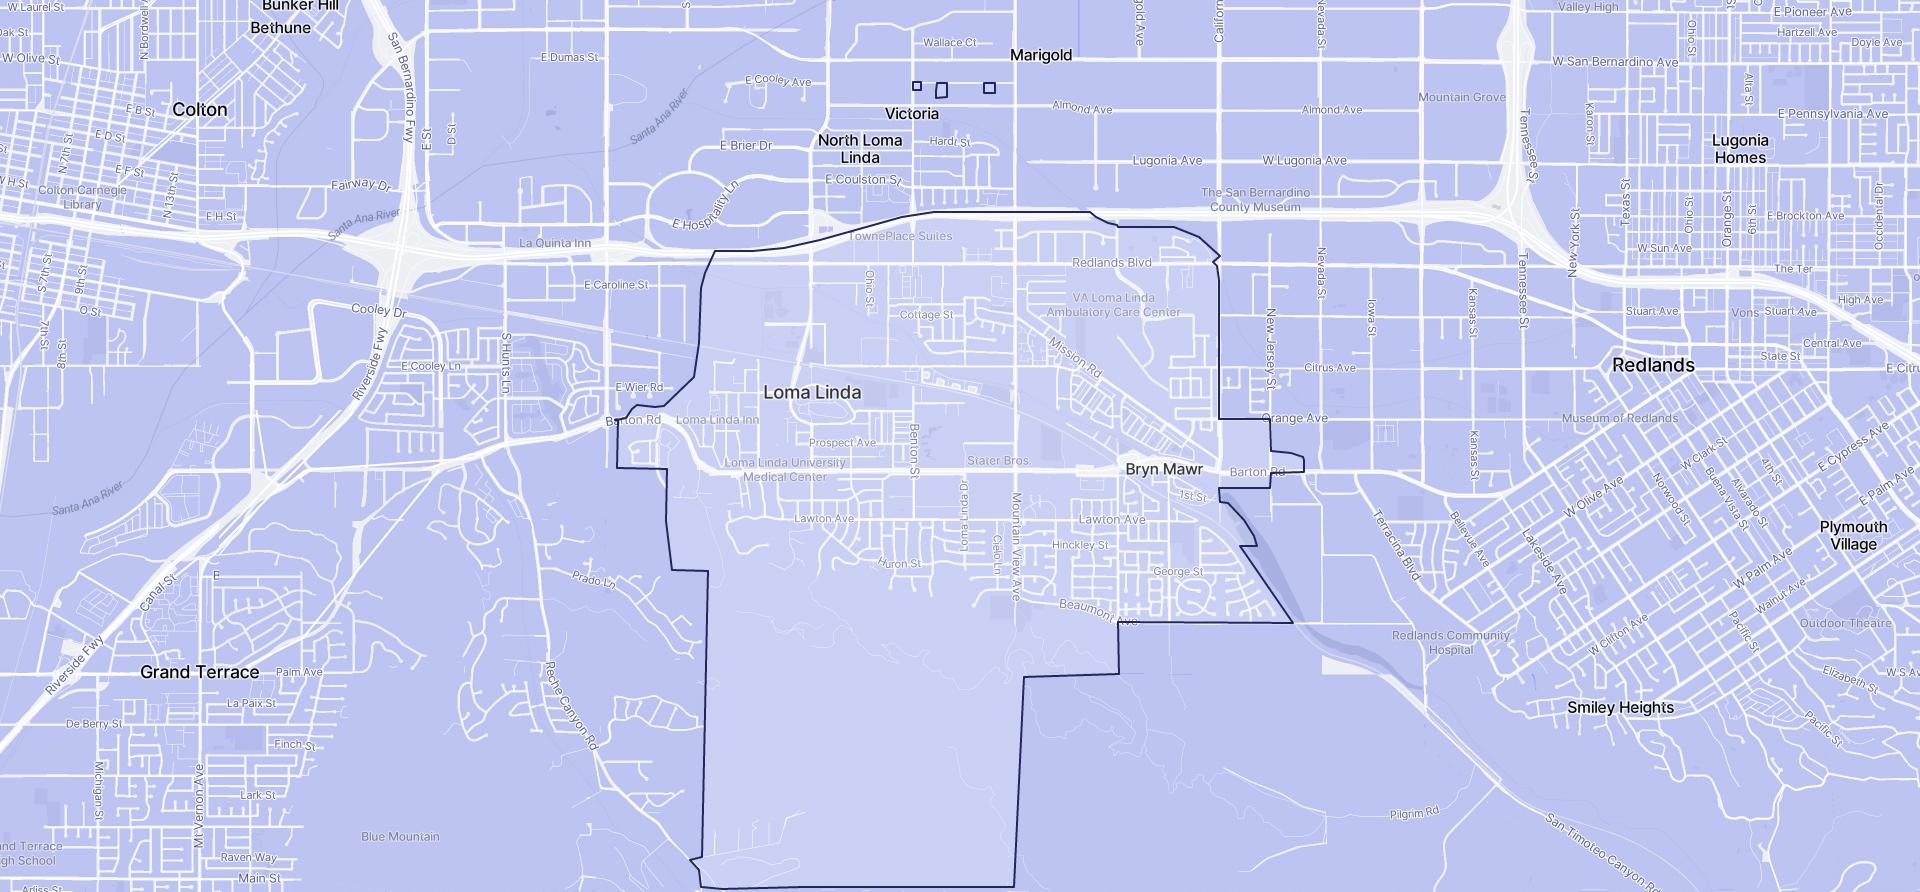 Image of Loma Linda boundaries on a map.